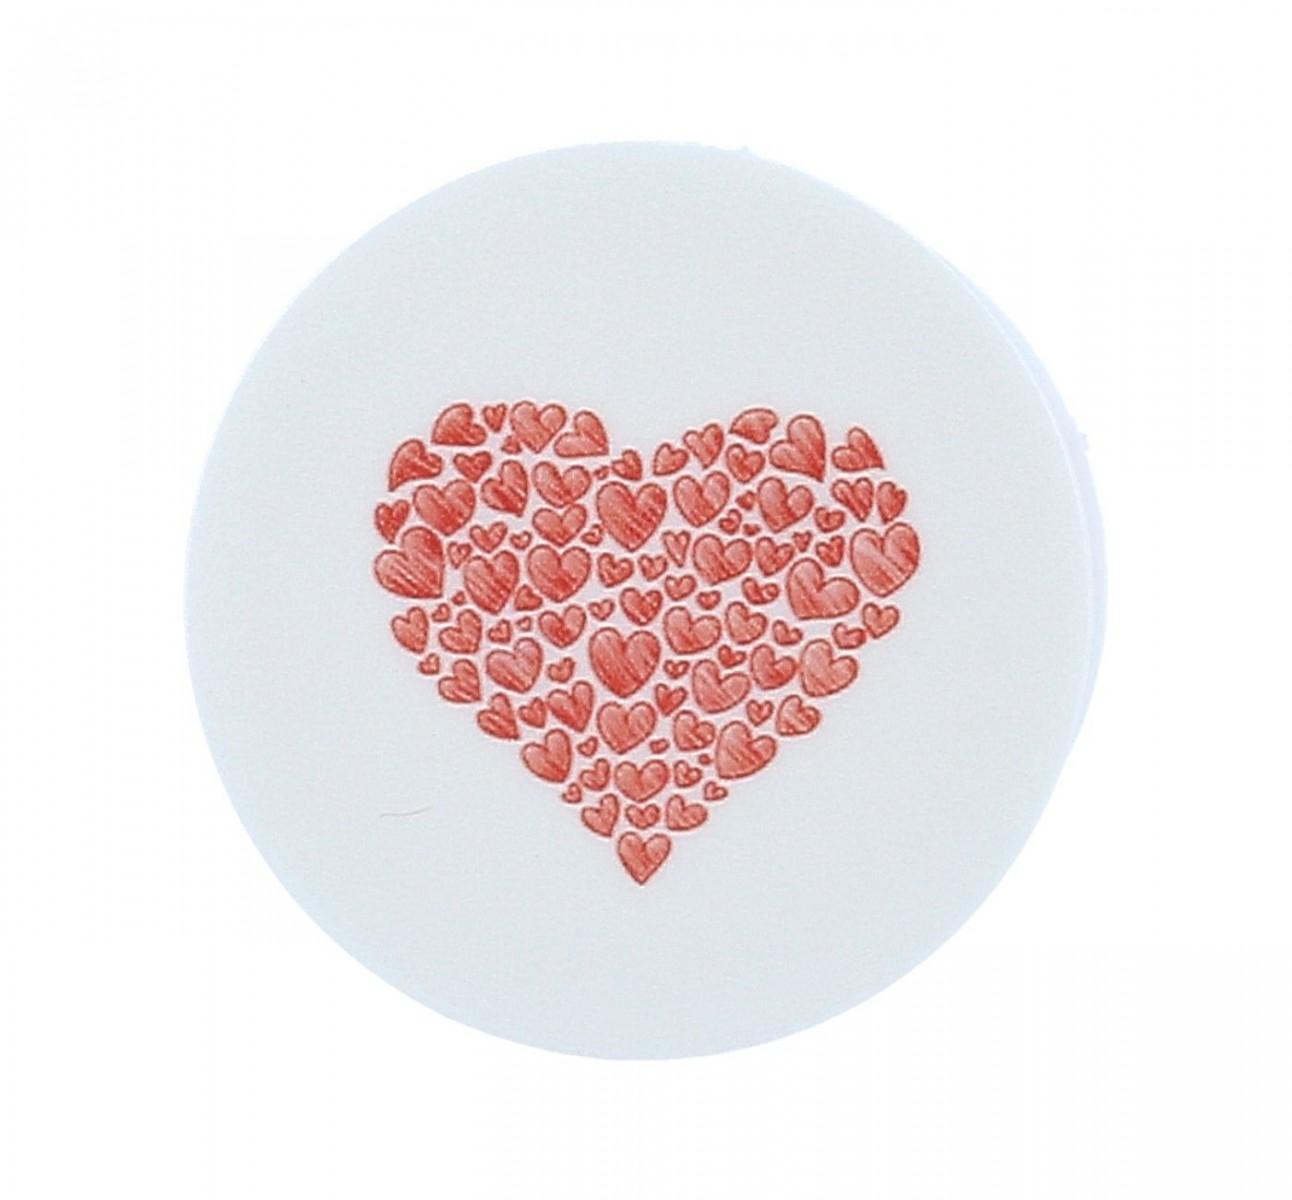 Držák na mobil TopQ PopSocket Red Hearts 39150